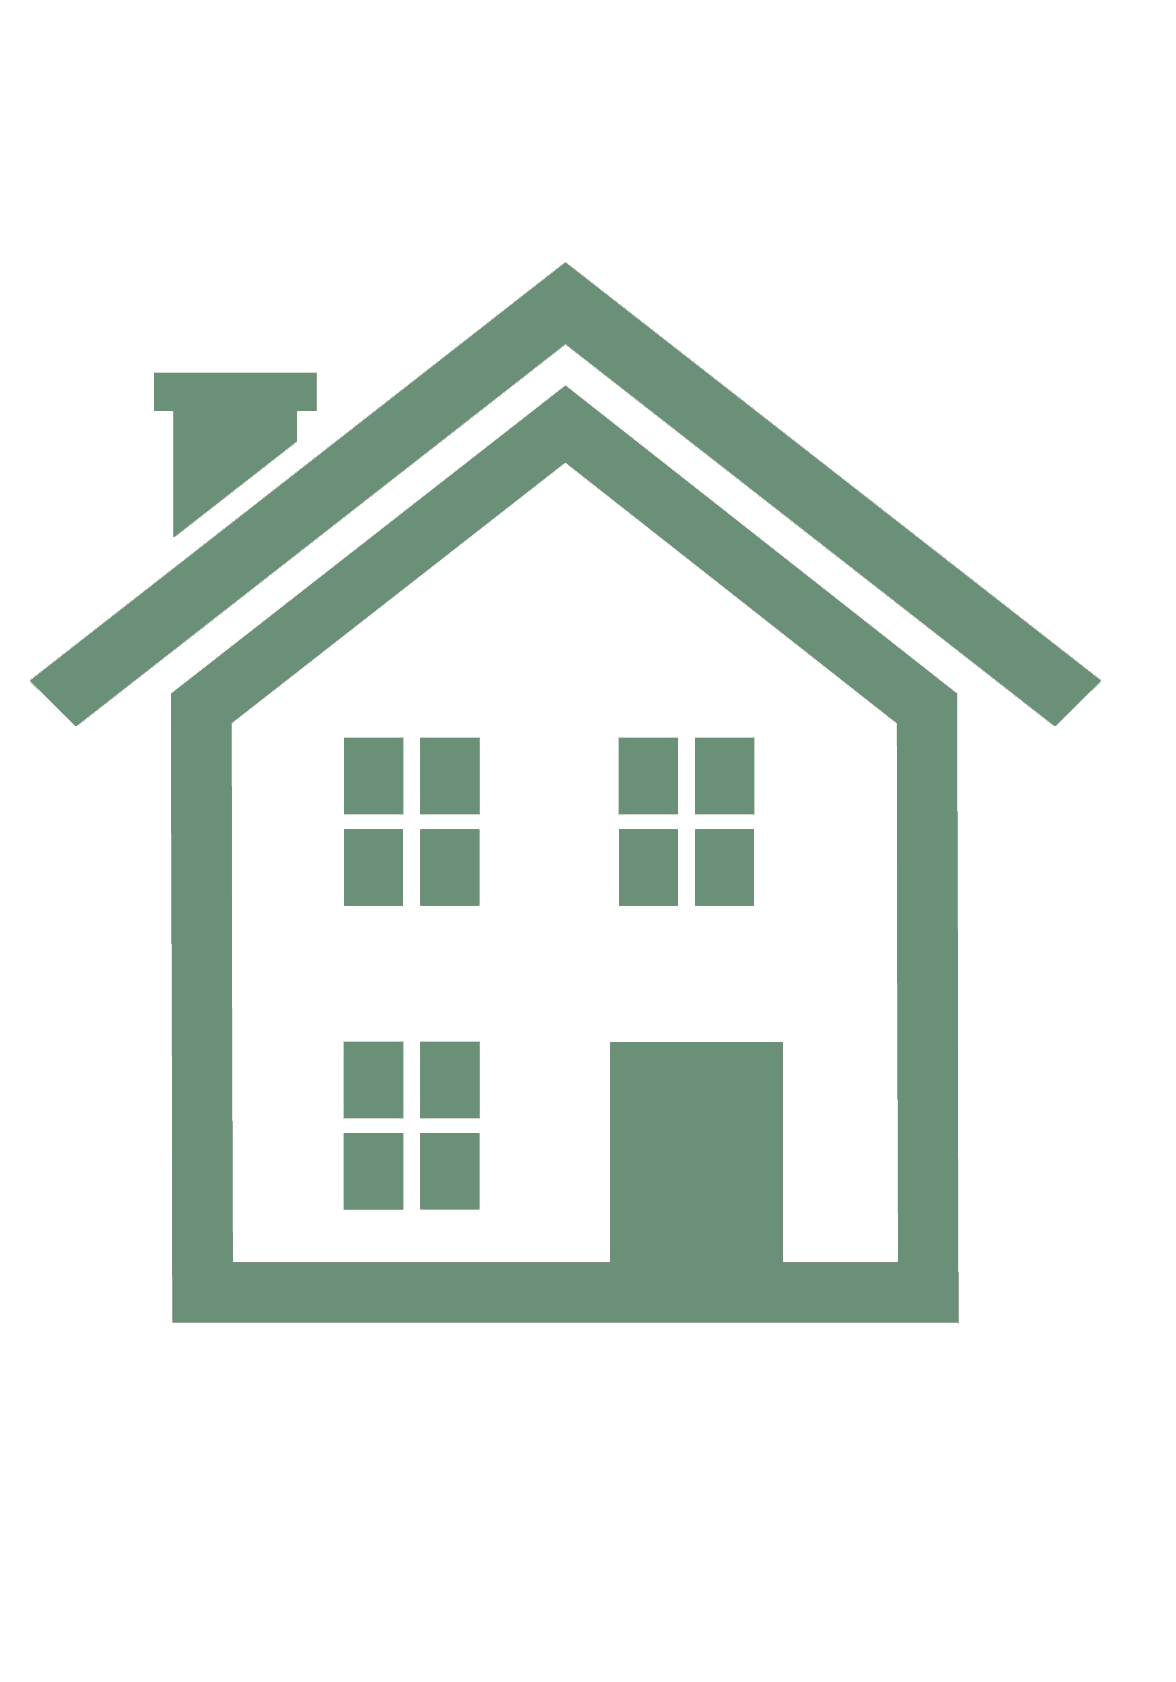 house_icon1